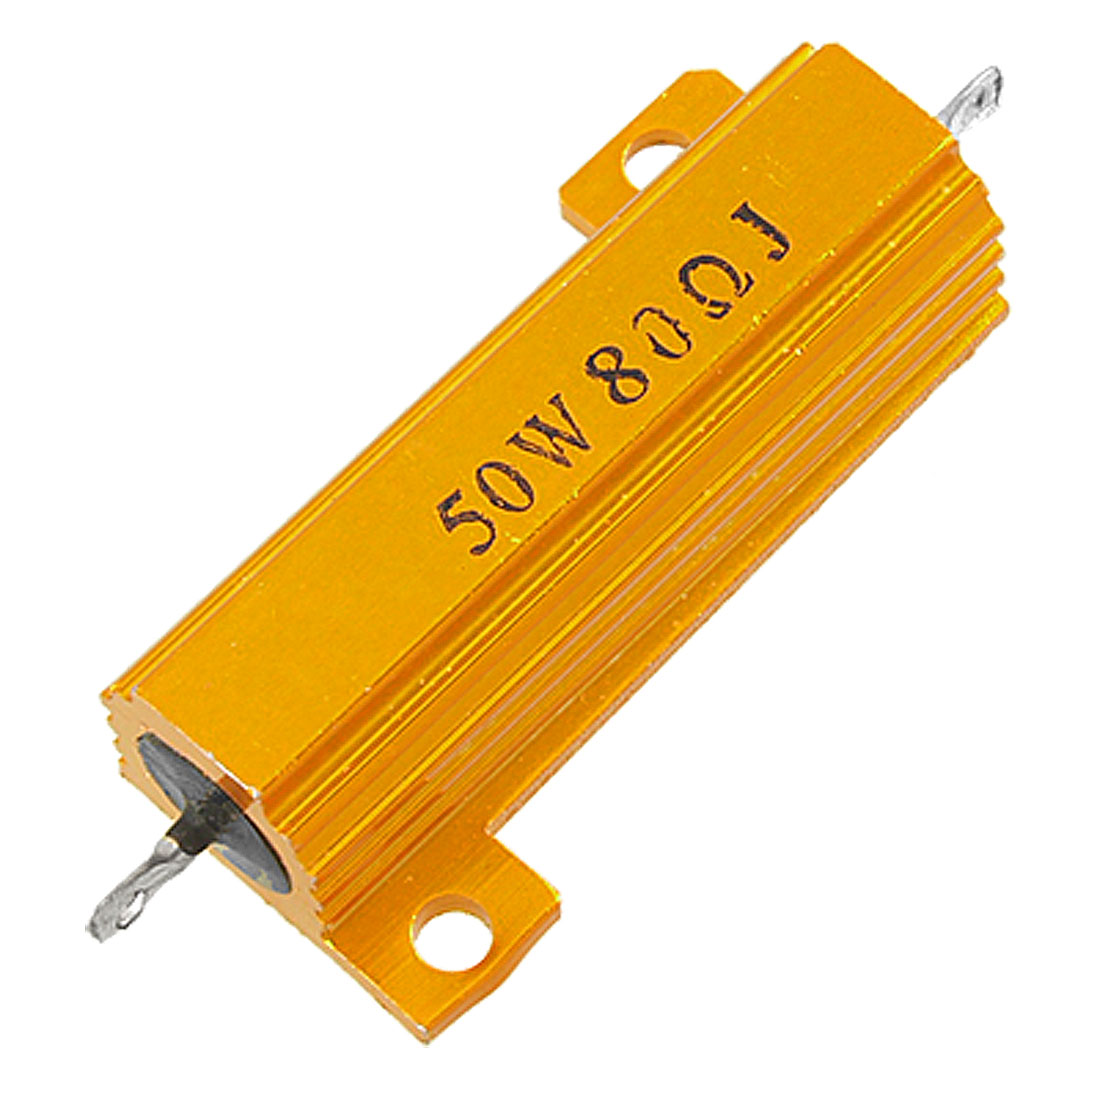 Gold Tone Wirewound Aluminium Clad Power Resistor 5% 50W 80 Ohm